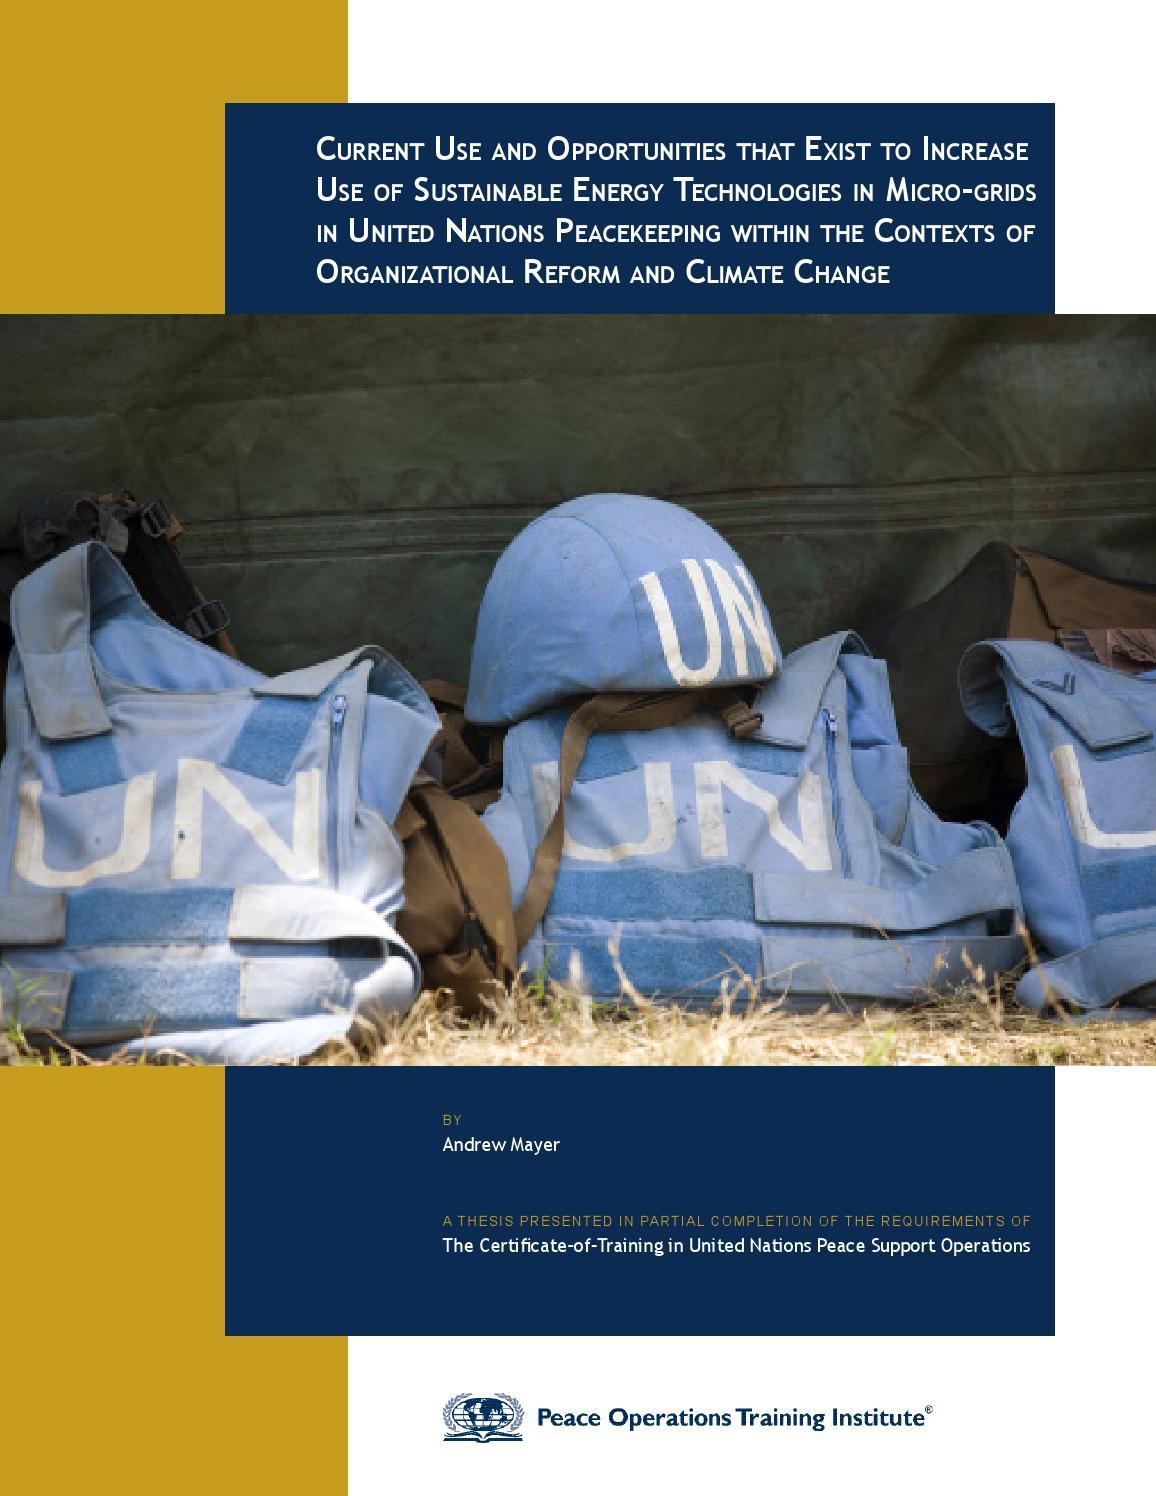 the failure of united nations peacekeeping 3 olusegunobansanjo,thenpresidentofnigeria,successfullyledafricandiplomaticefforts thatresultedinliberianpresidentcharlestaylora.